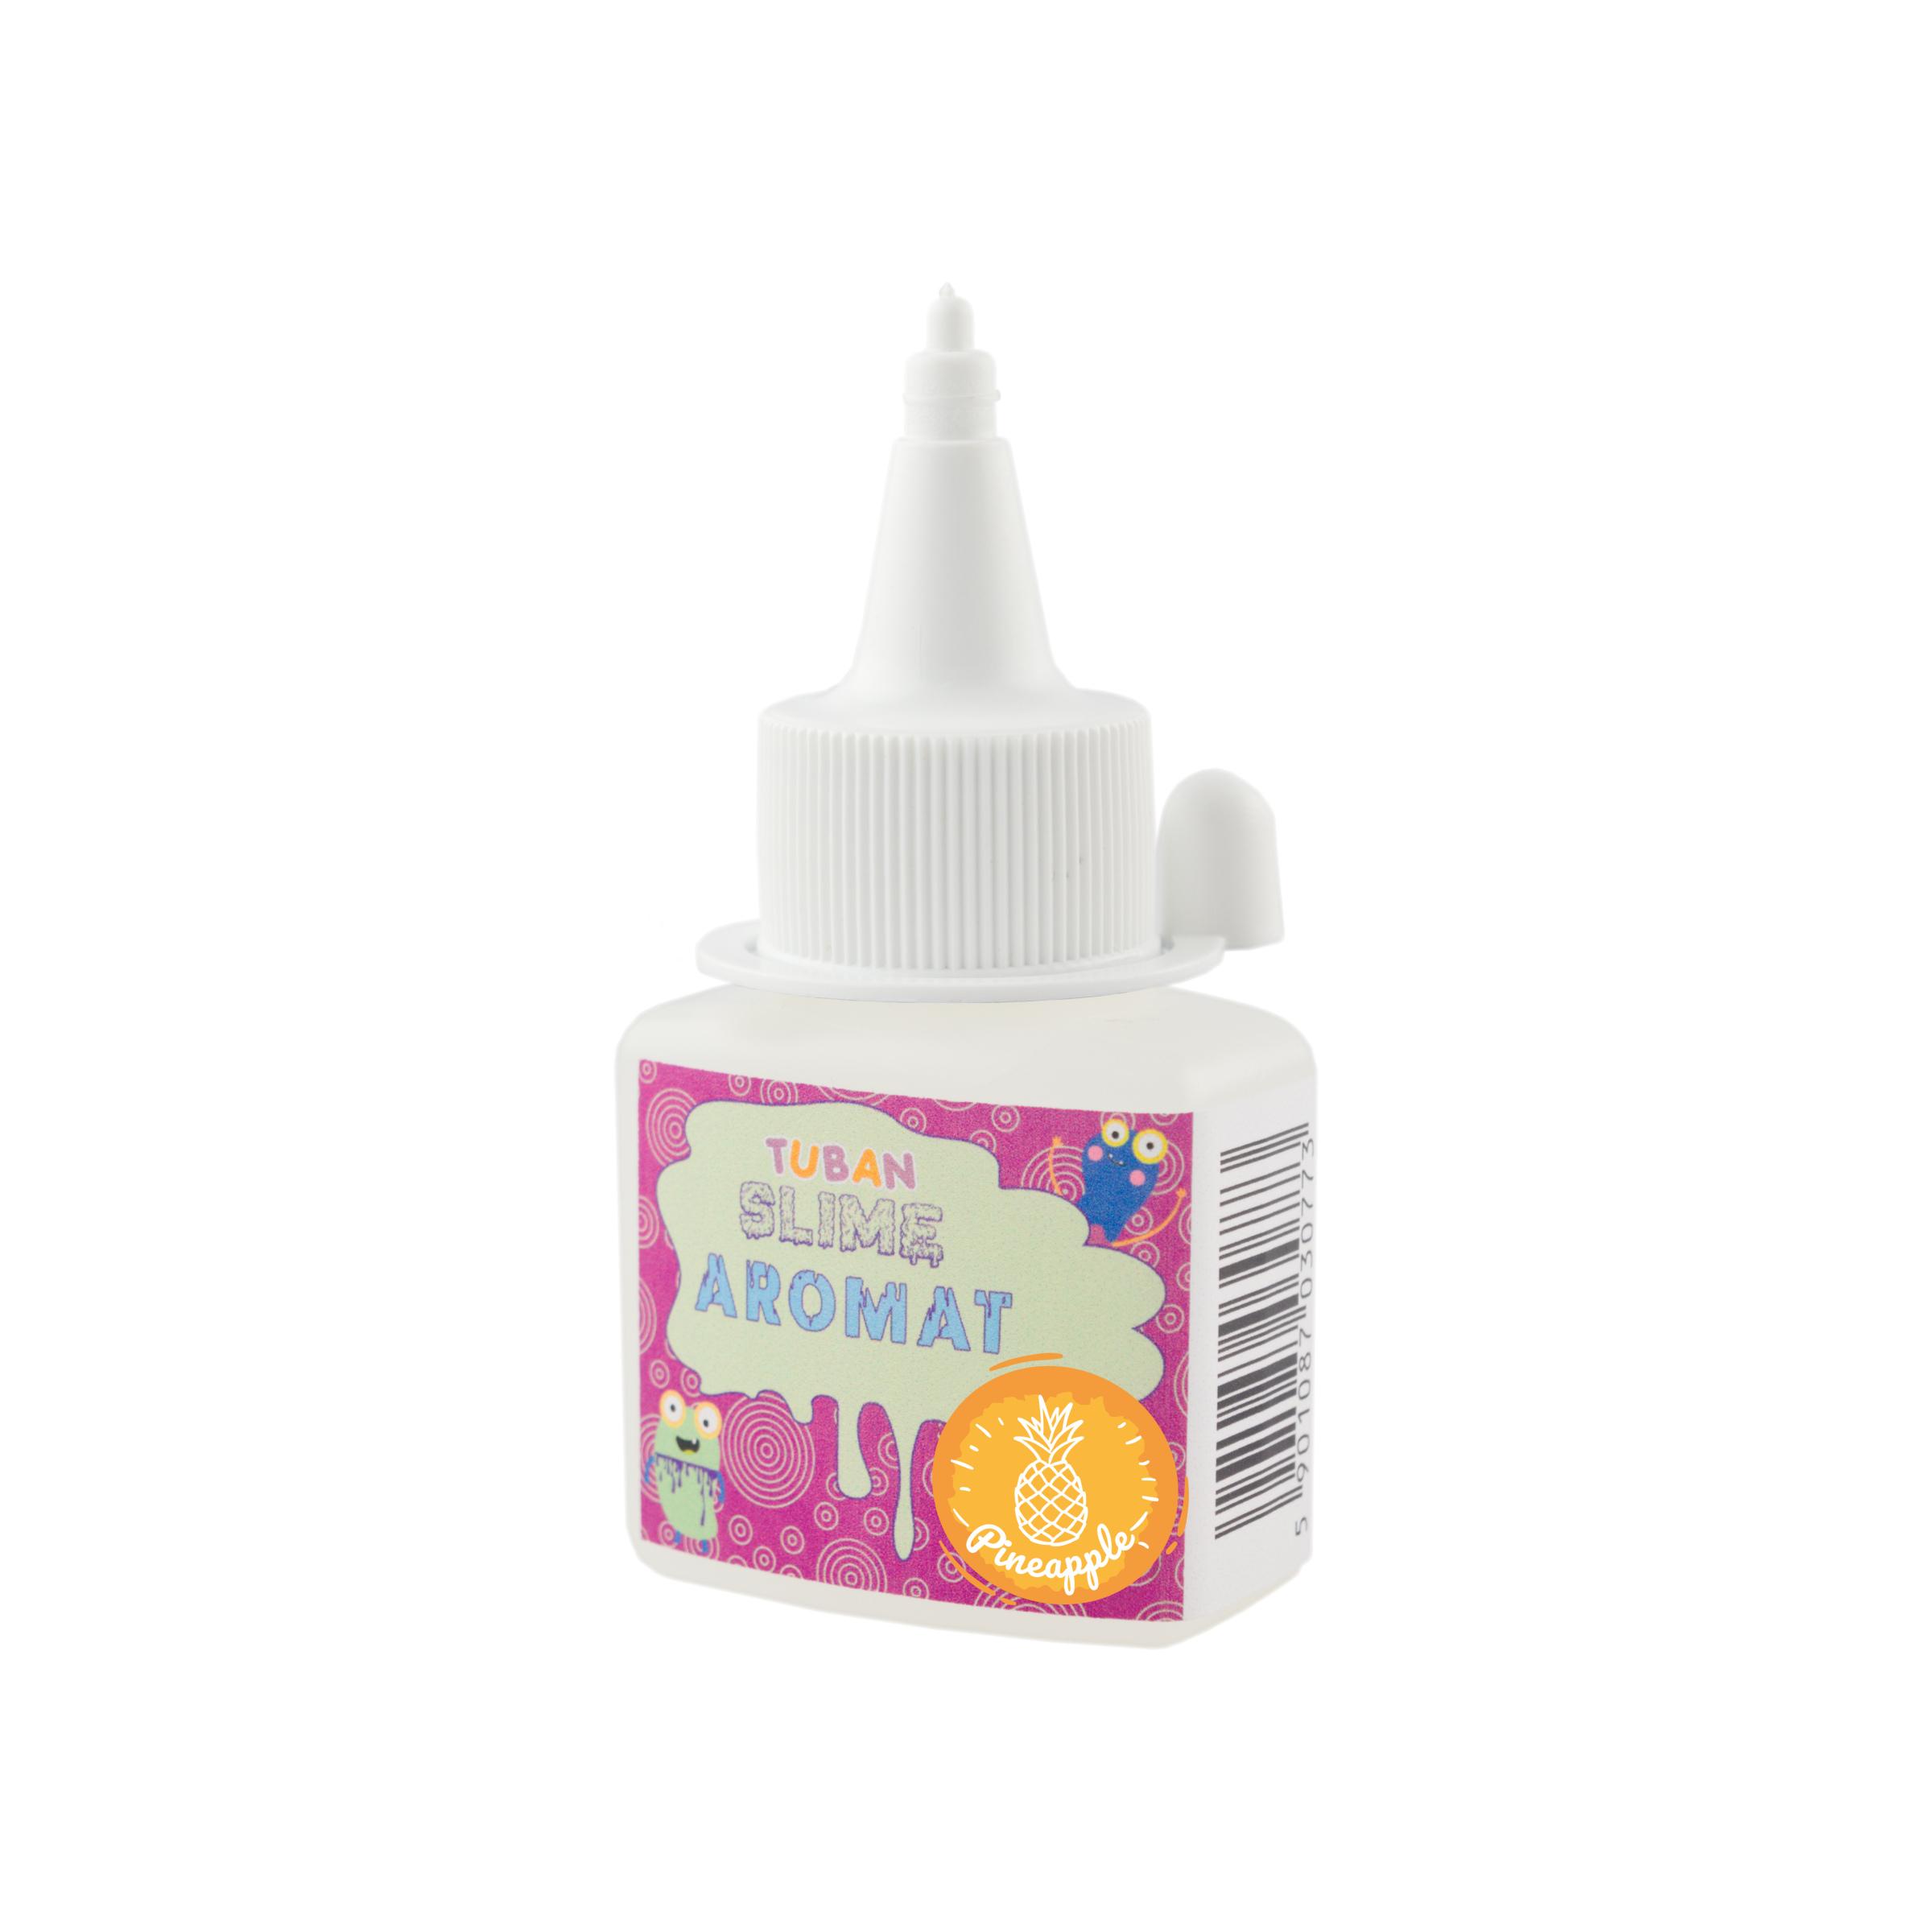 Tuban - Super Slime - Aroma mit Ananasduft - 35 ml - by Jablka